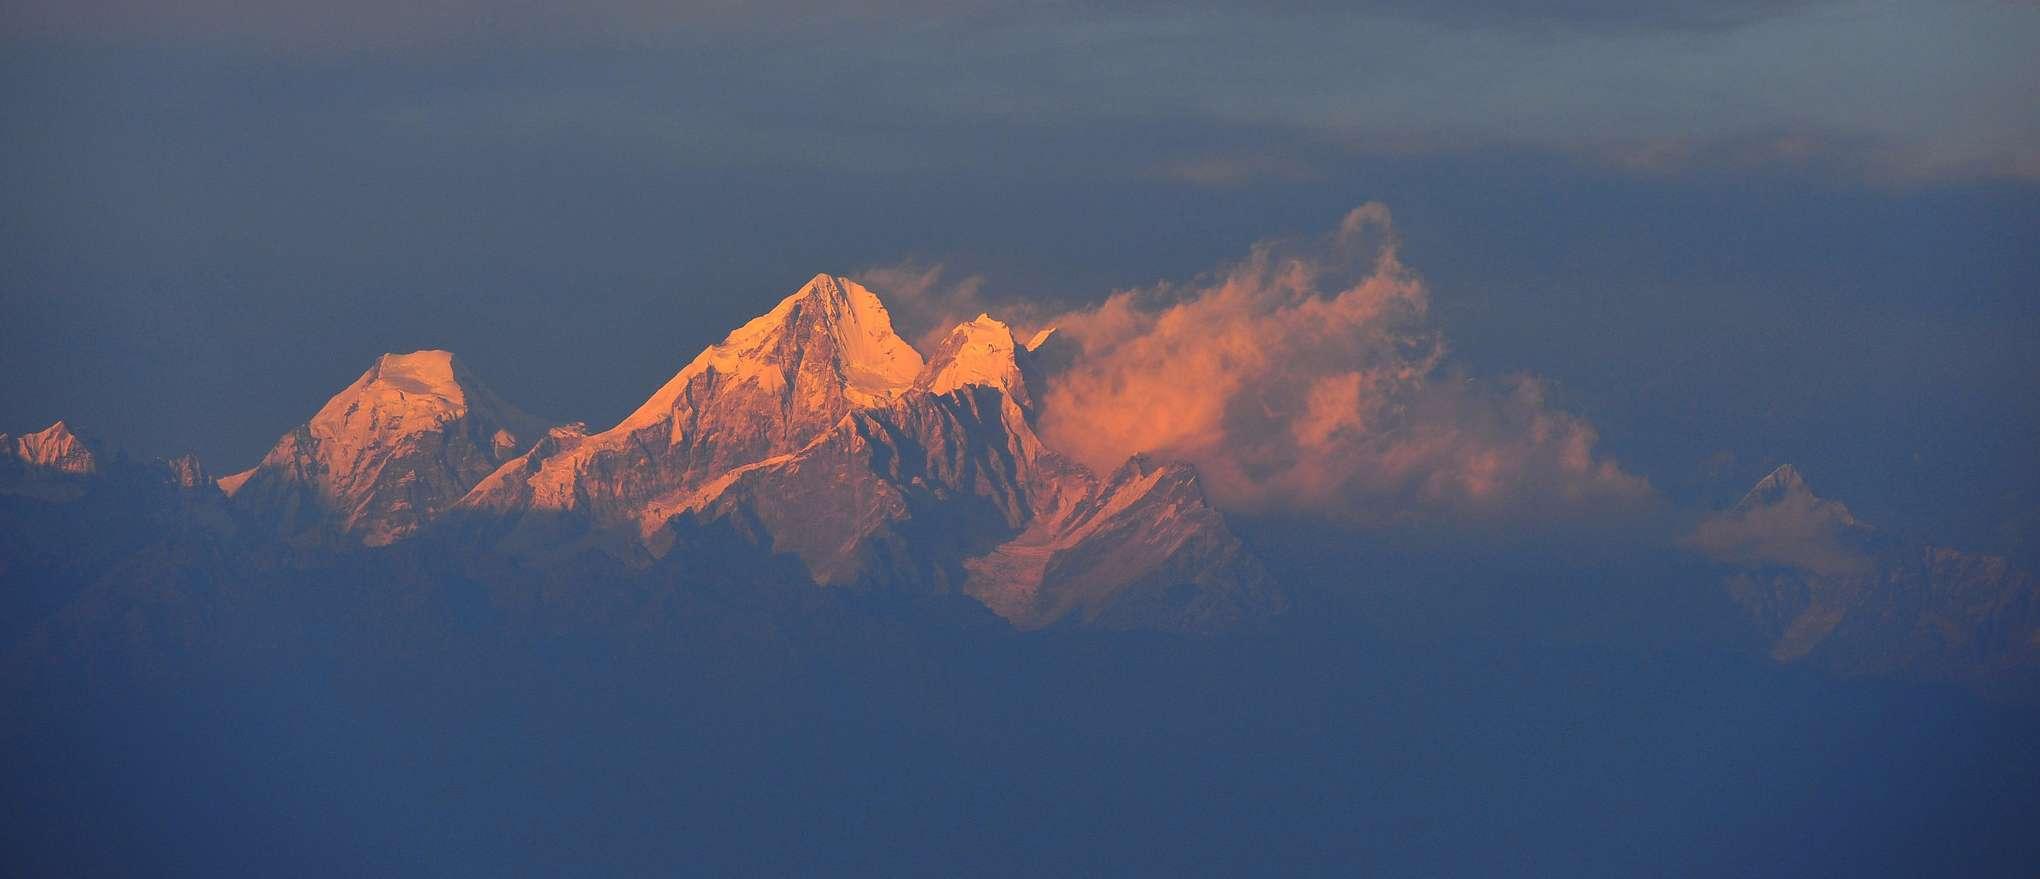 3-Day Chisopani Nagarkot Trek - Nepal Itinerary